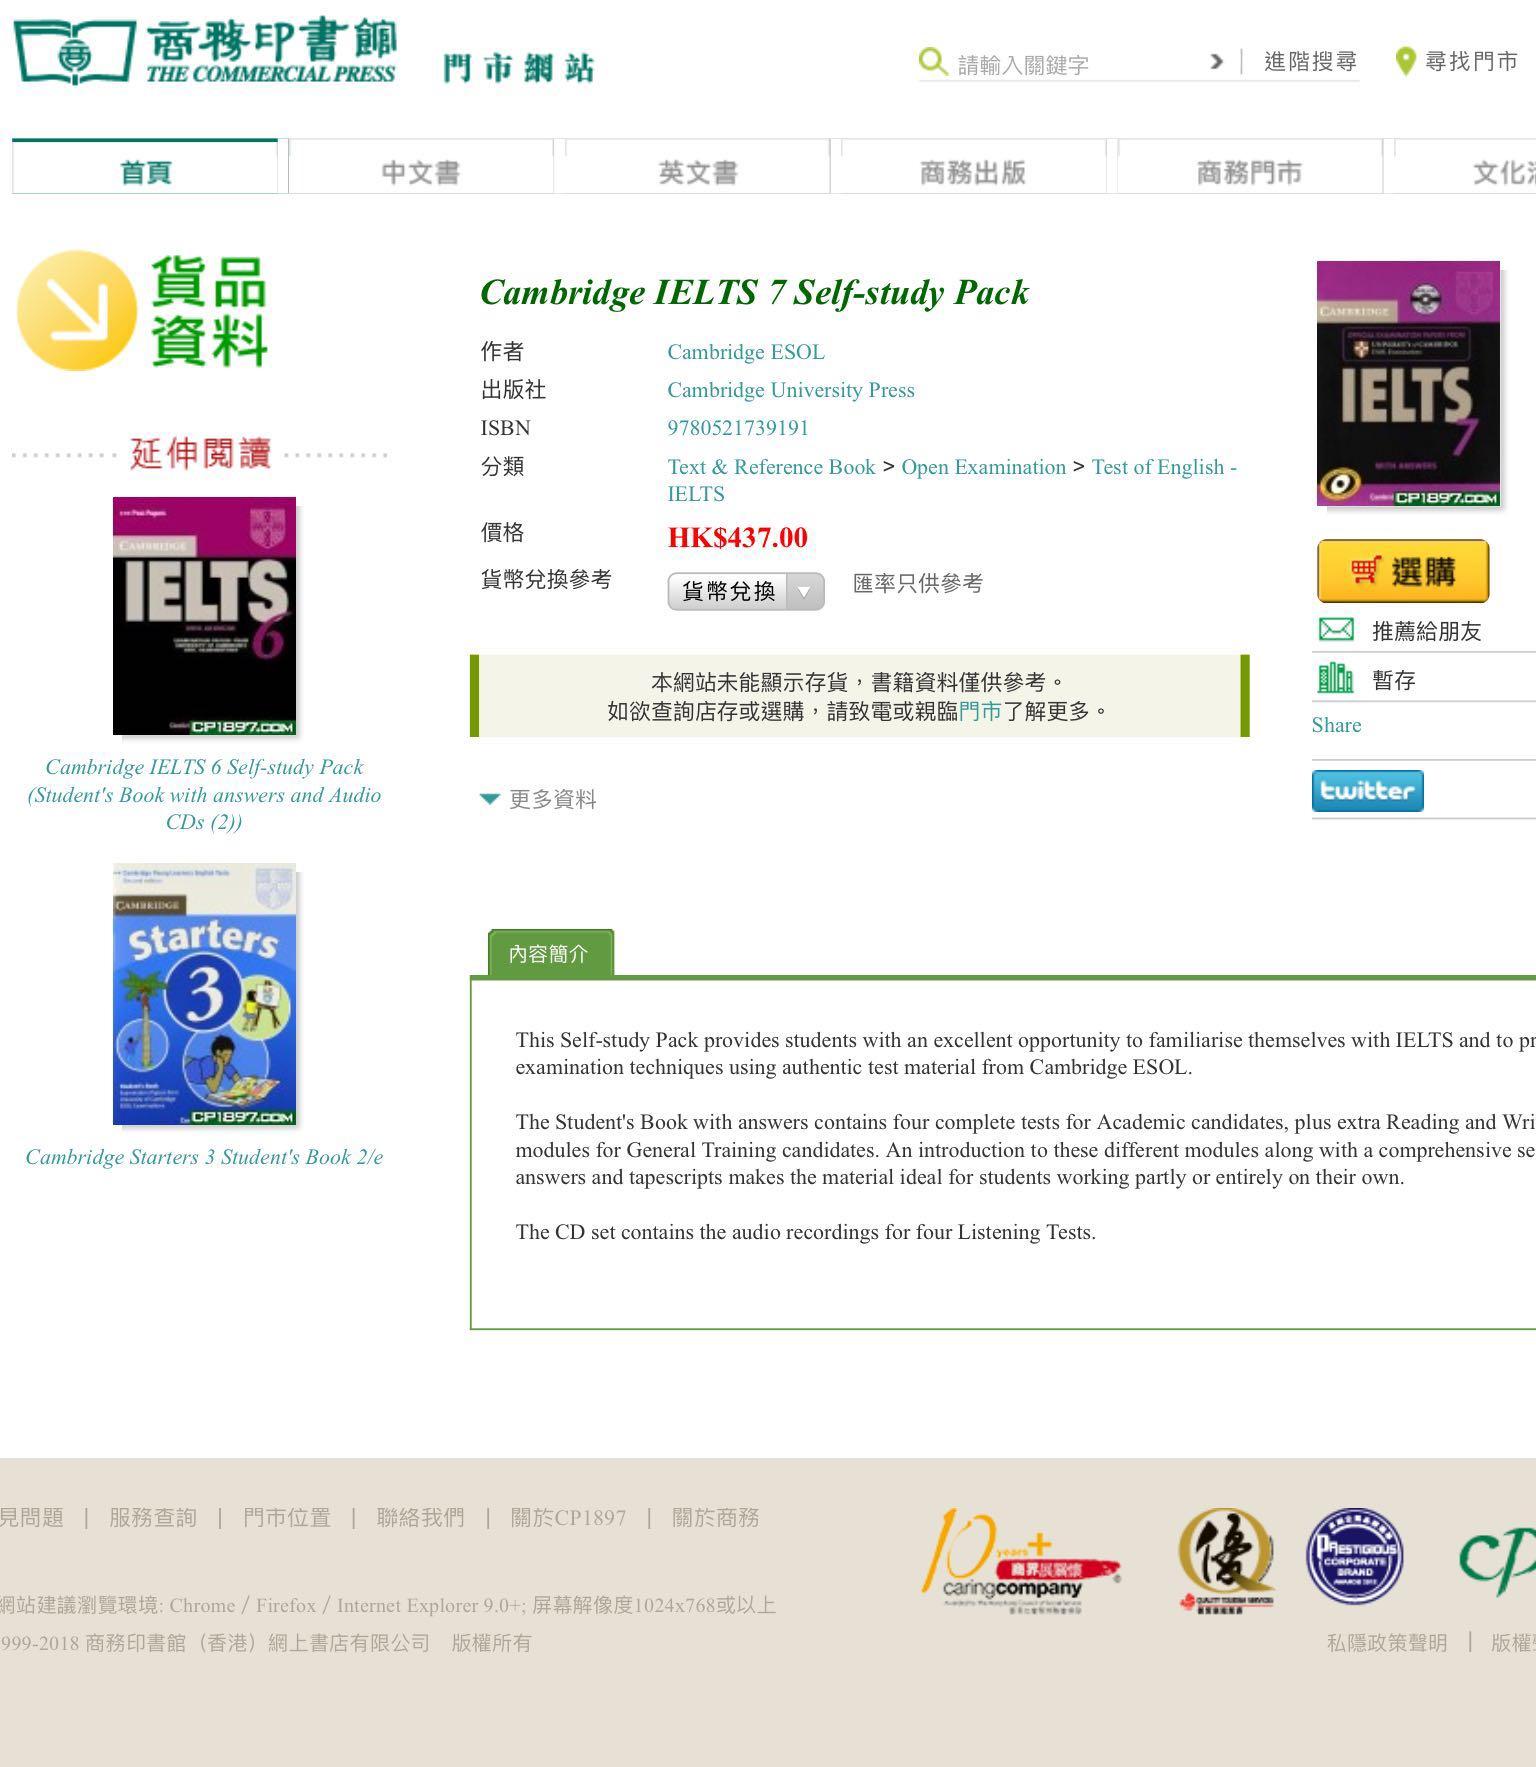 考IELTS必備!Cambridge 出版IELTS 7 Self-study Pack!有official考試Past paper 同答案,  有CD聽埋listening